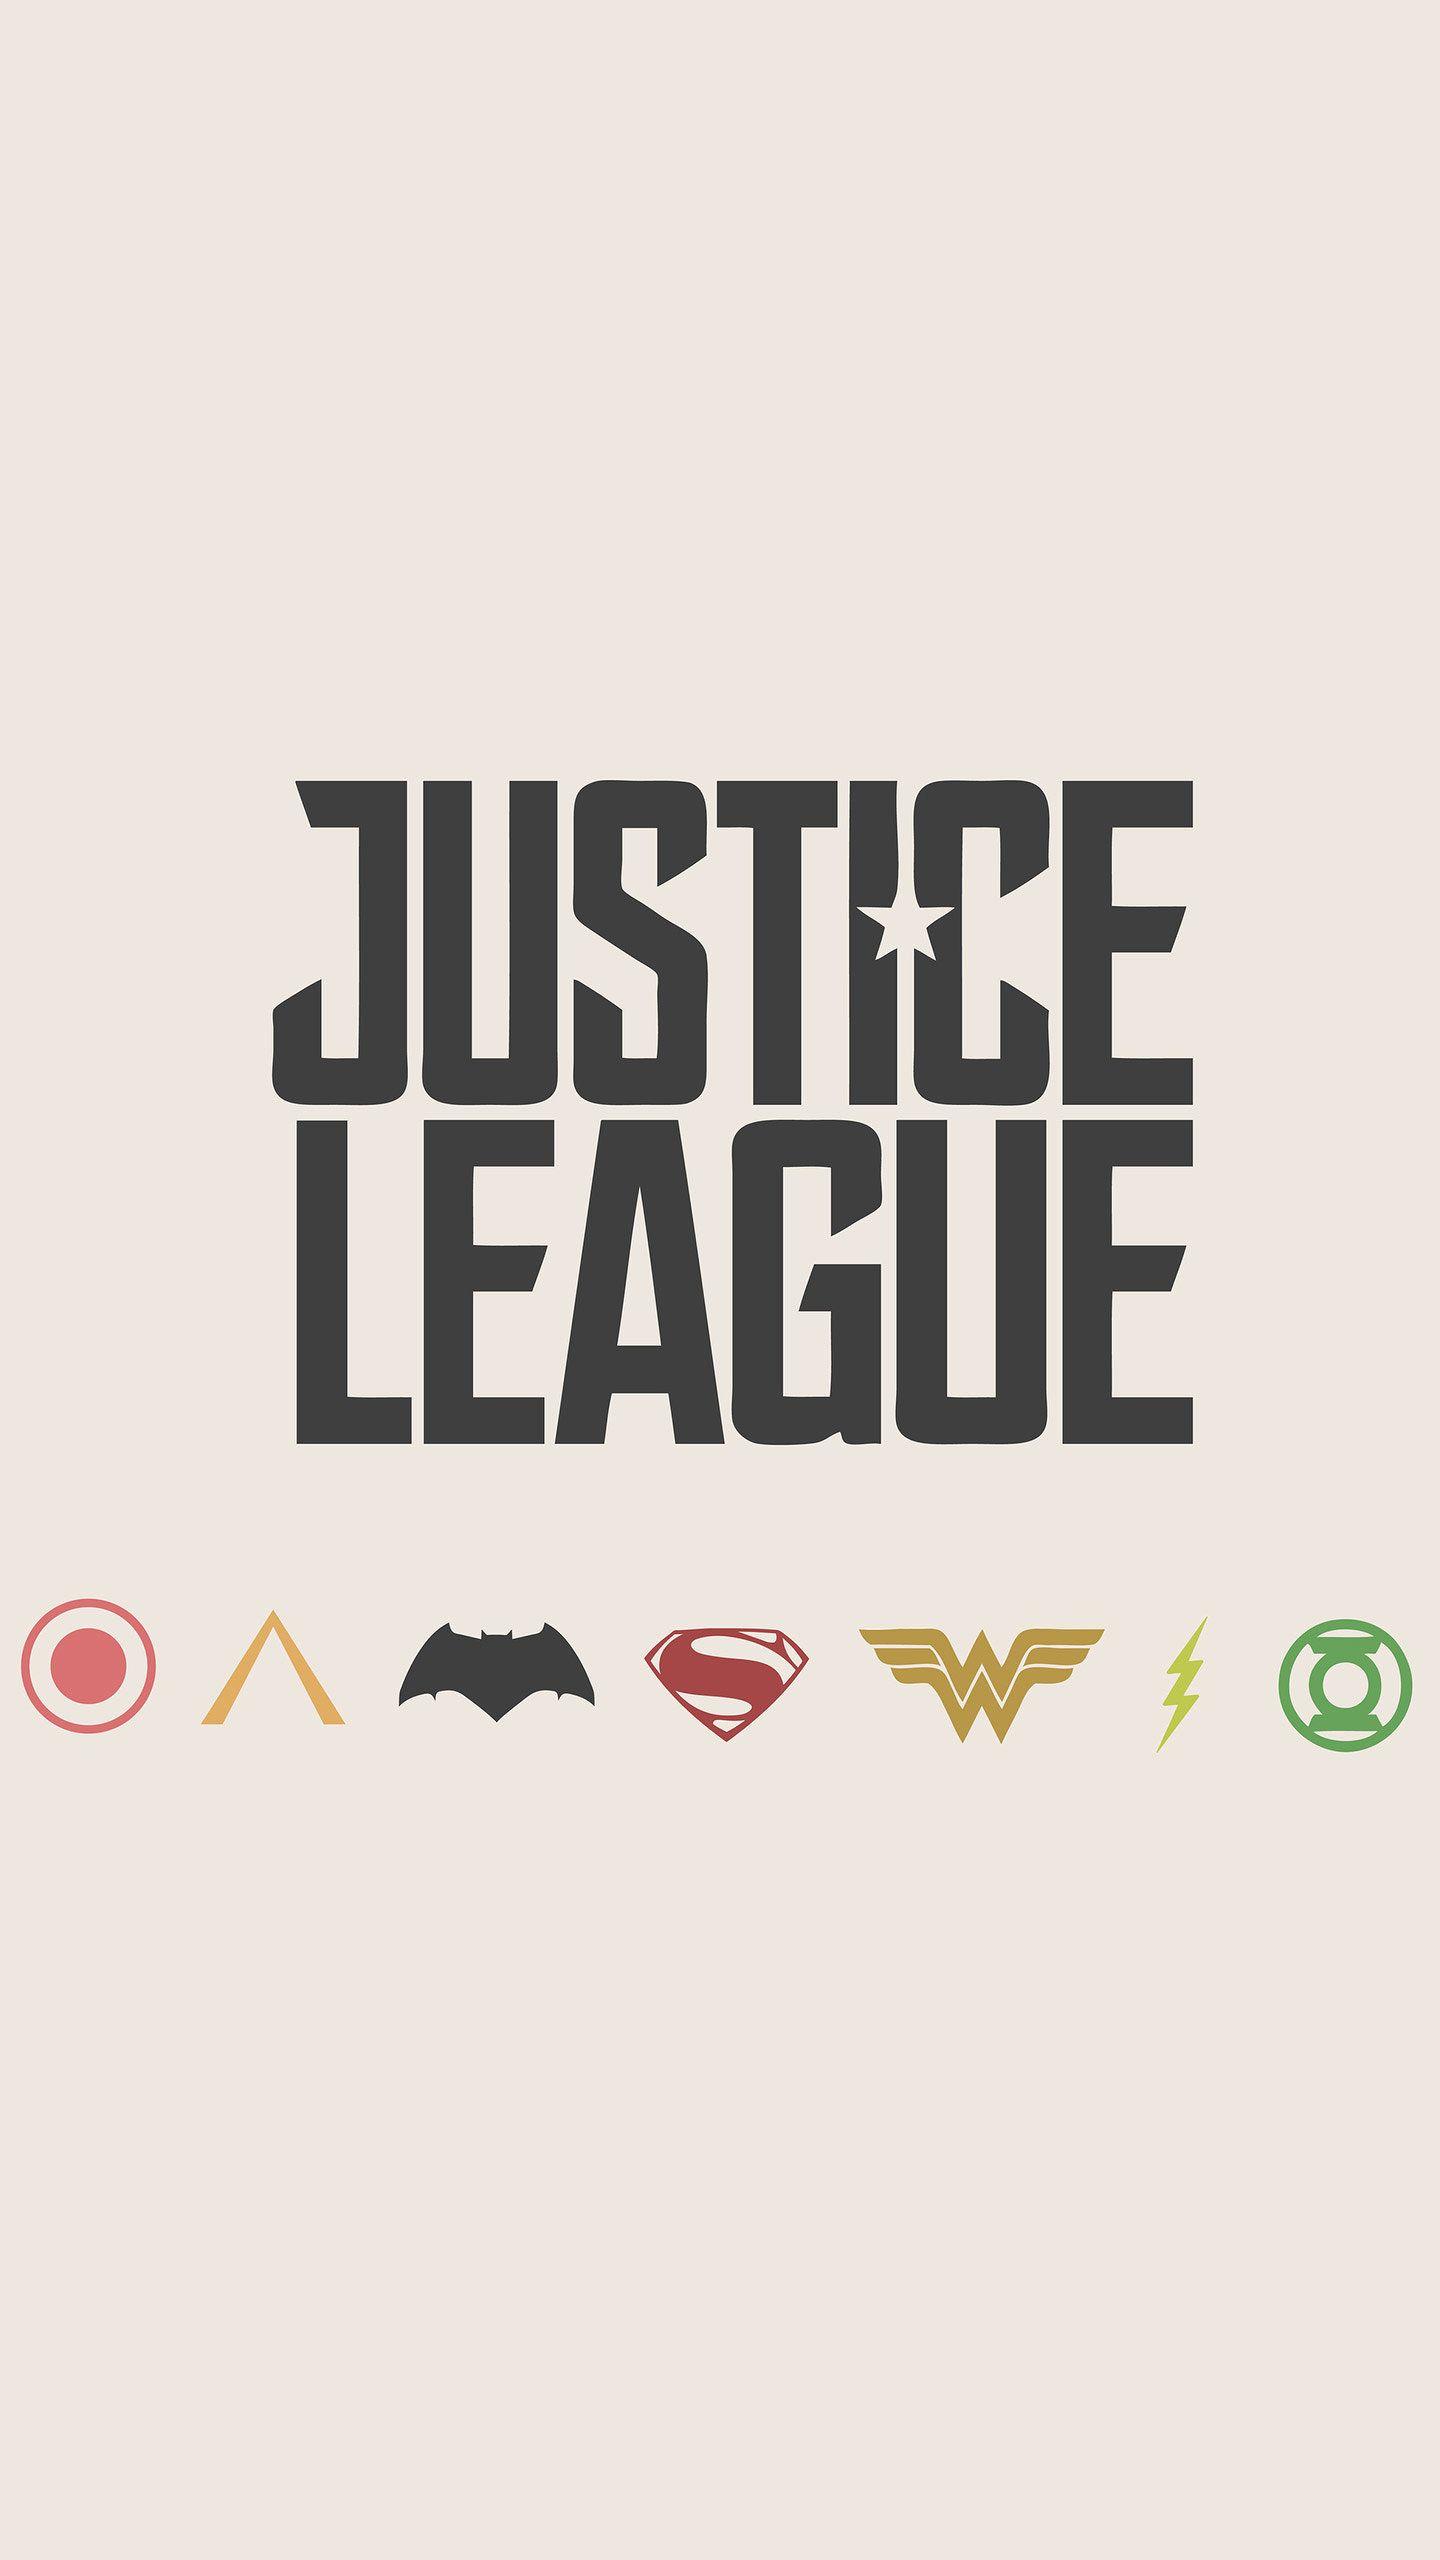 Justice League Minimalism Logos 4k Hd Superheroes Wallpapers Photos And Pictures Id 27339 Herois Desenhos Papeis De Parede Tumblr